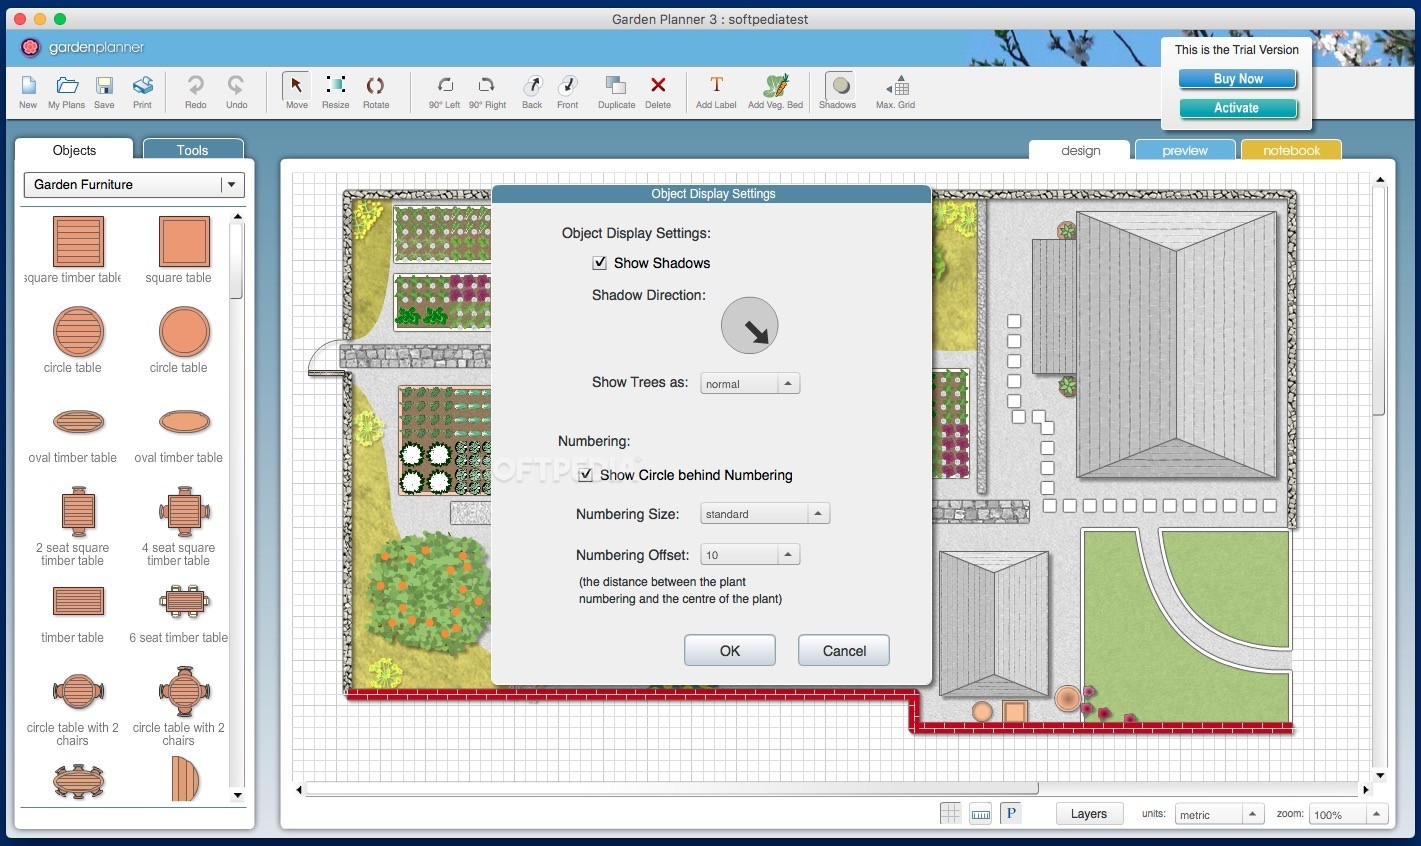 Garden Planner Mac 3.7.36 - Download